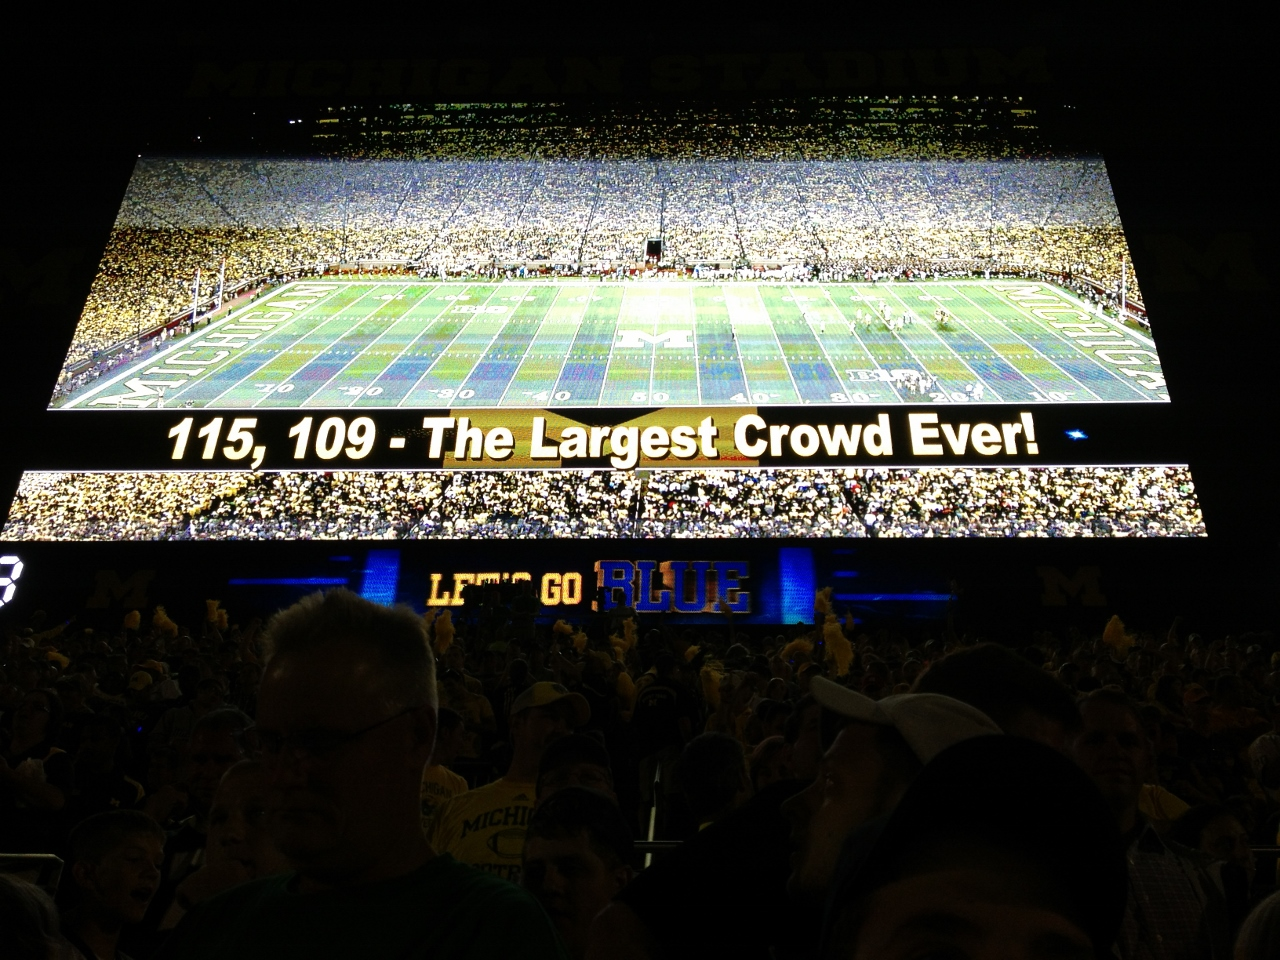 UofM Stadium - largest crowd ever